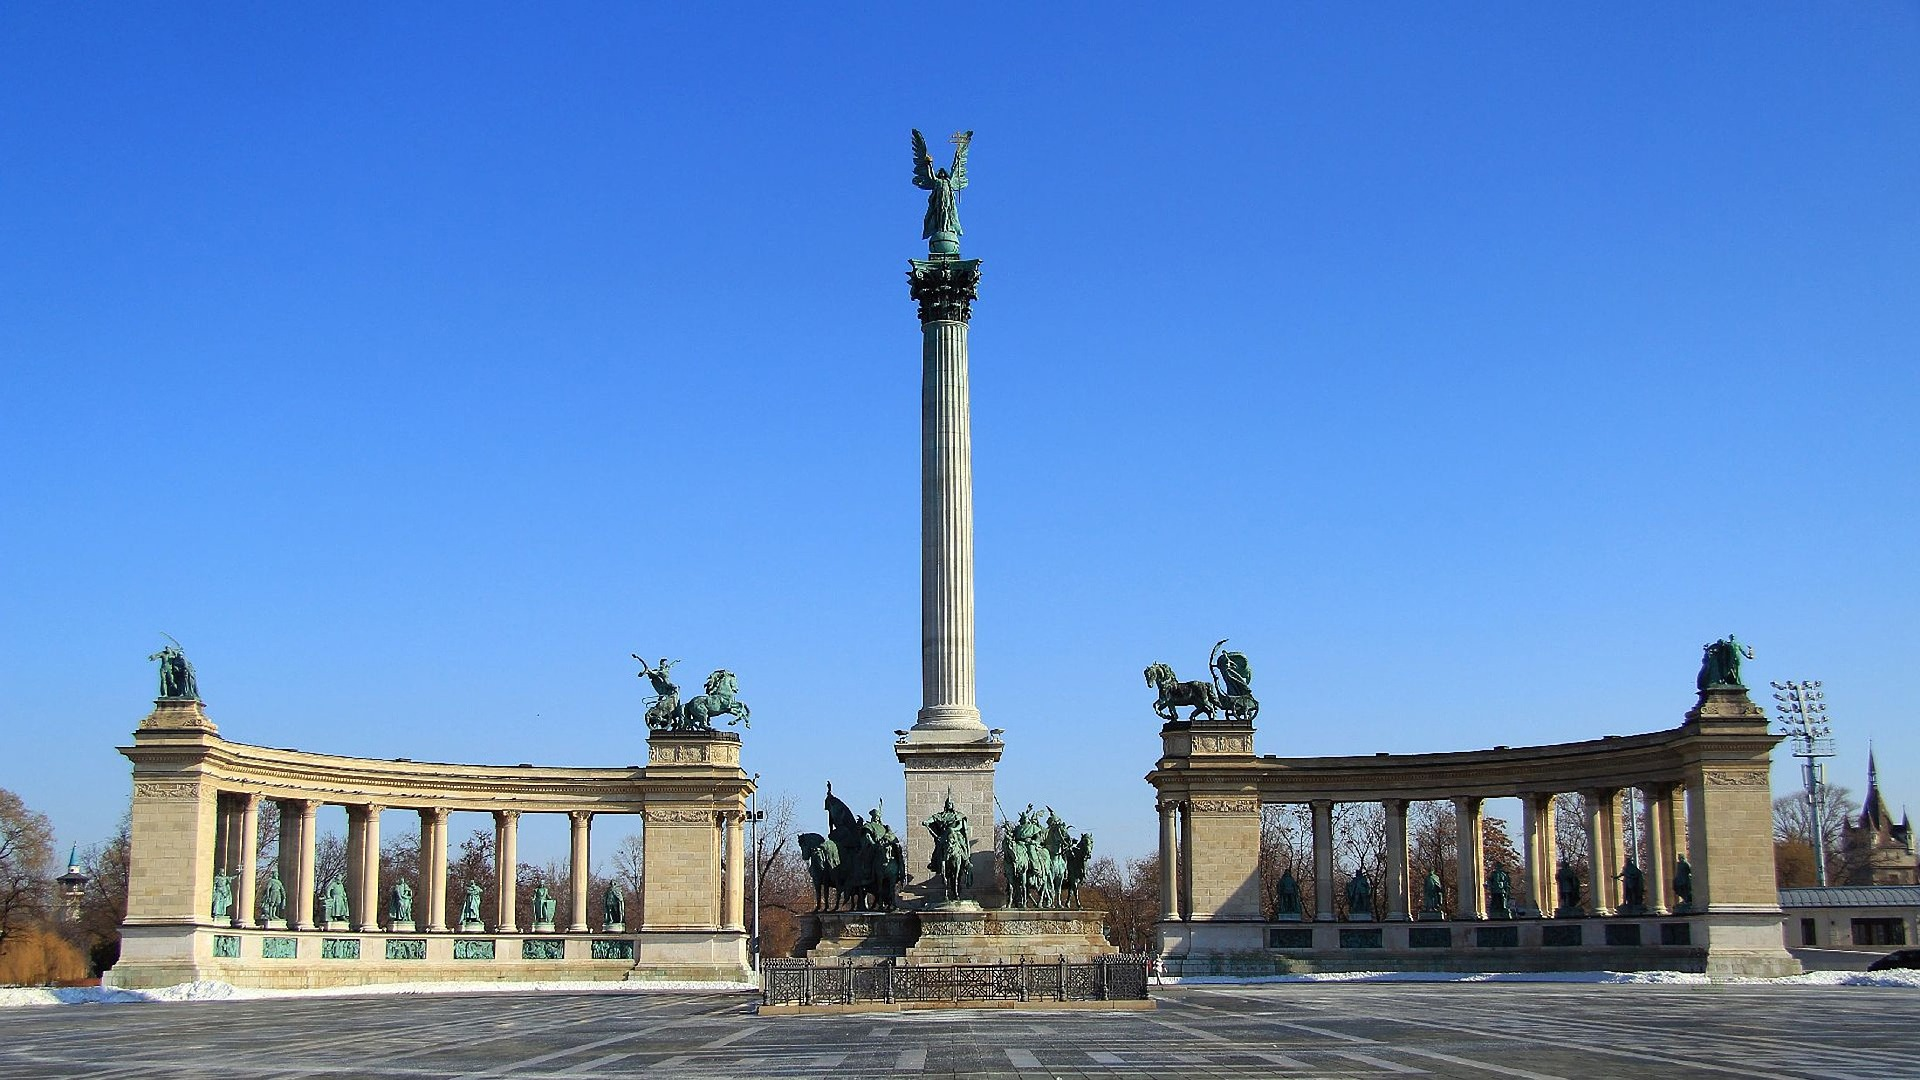 Heroe's Square Budapest (Hősök tere), Budapest, Hungary